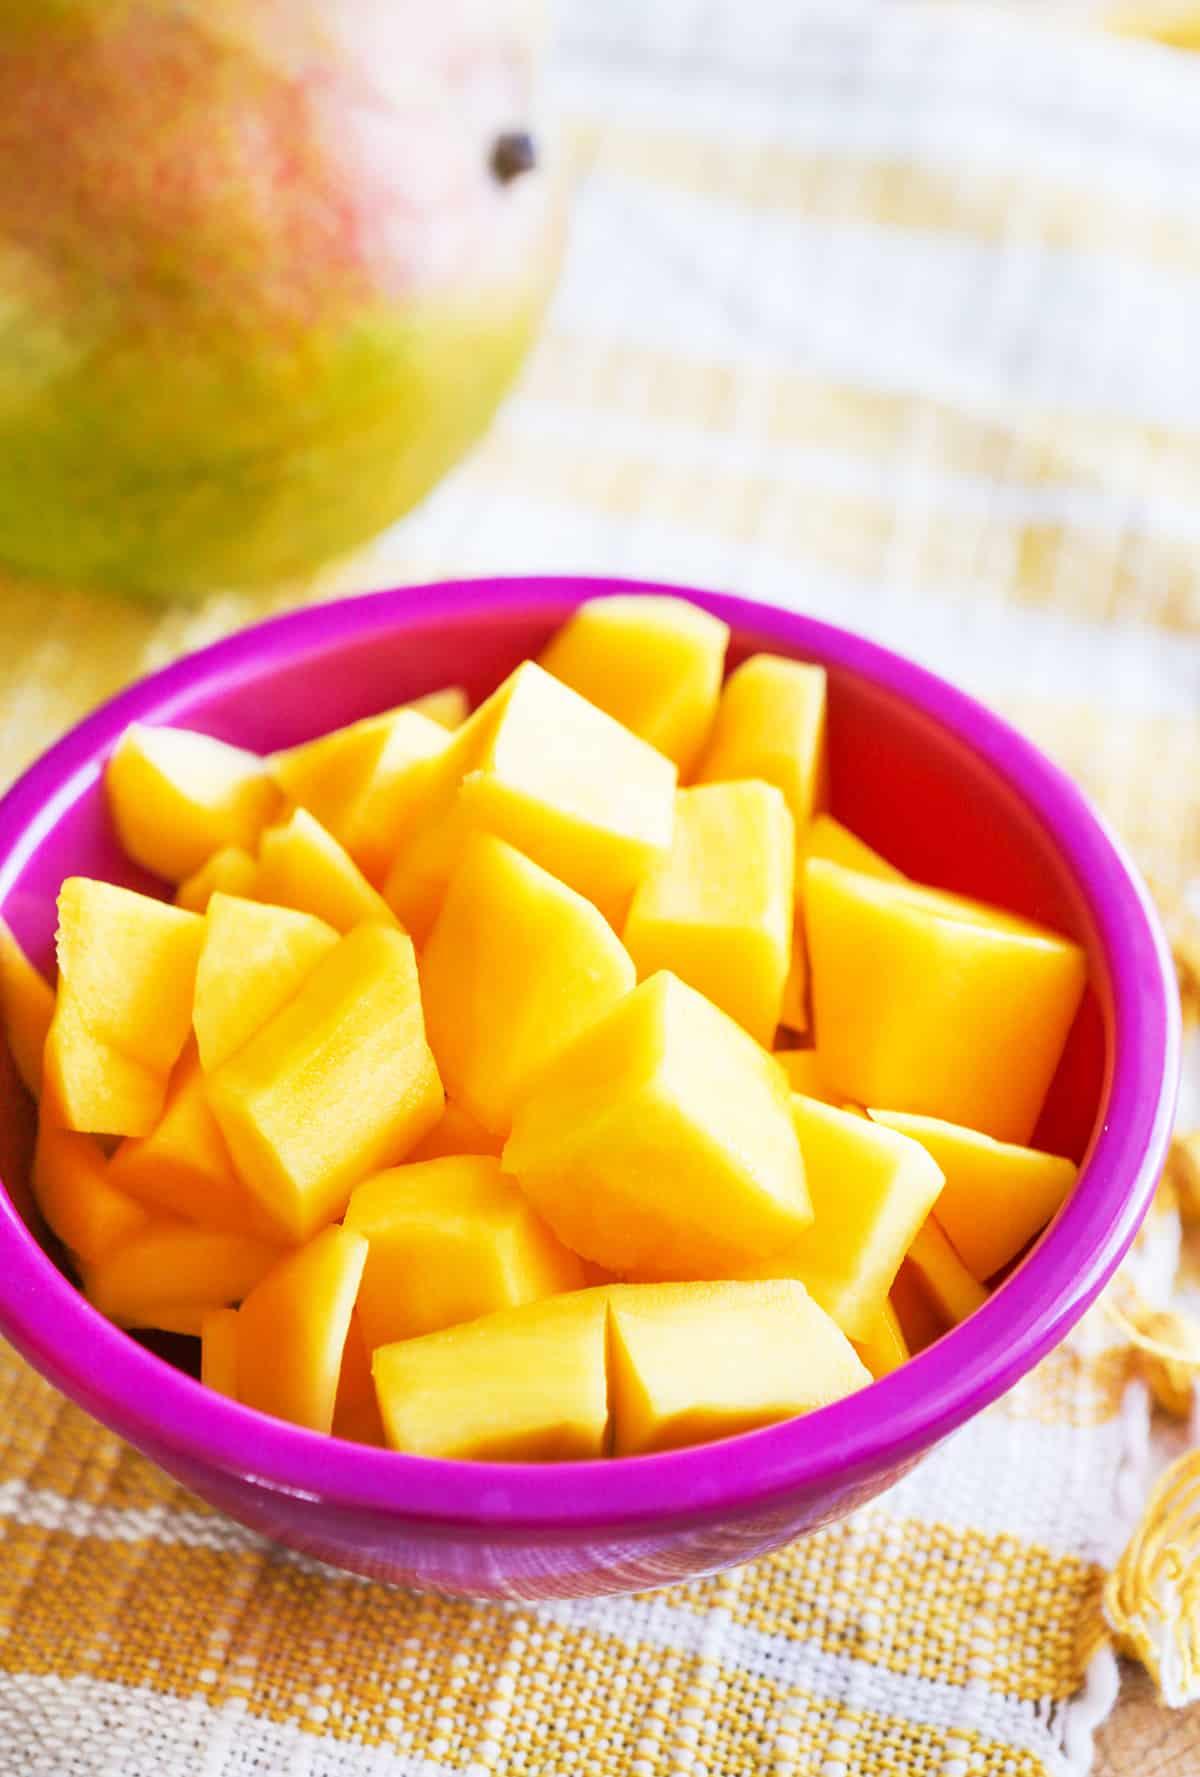 Bowl of mango pieces sitting next to a mango